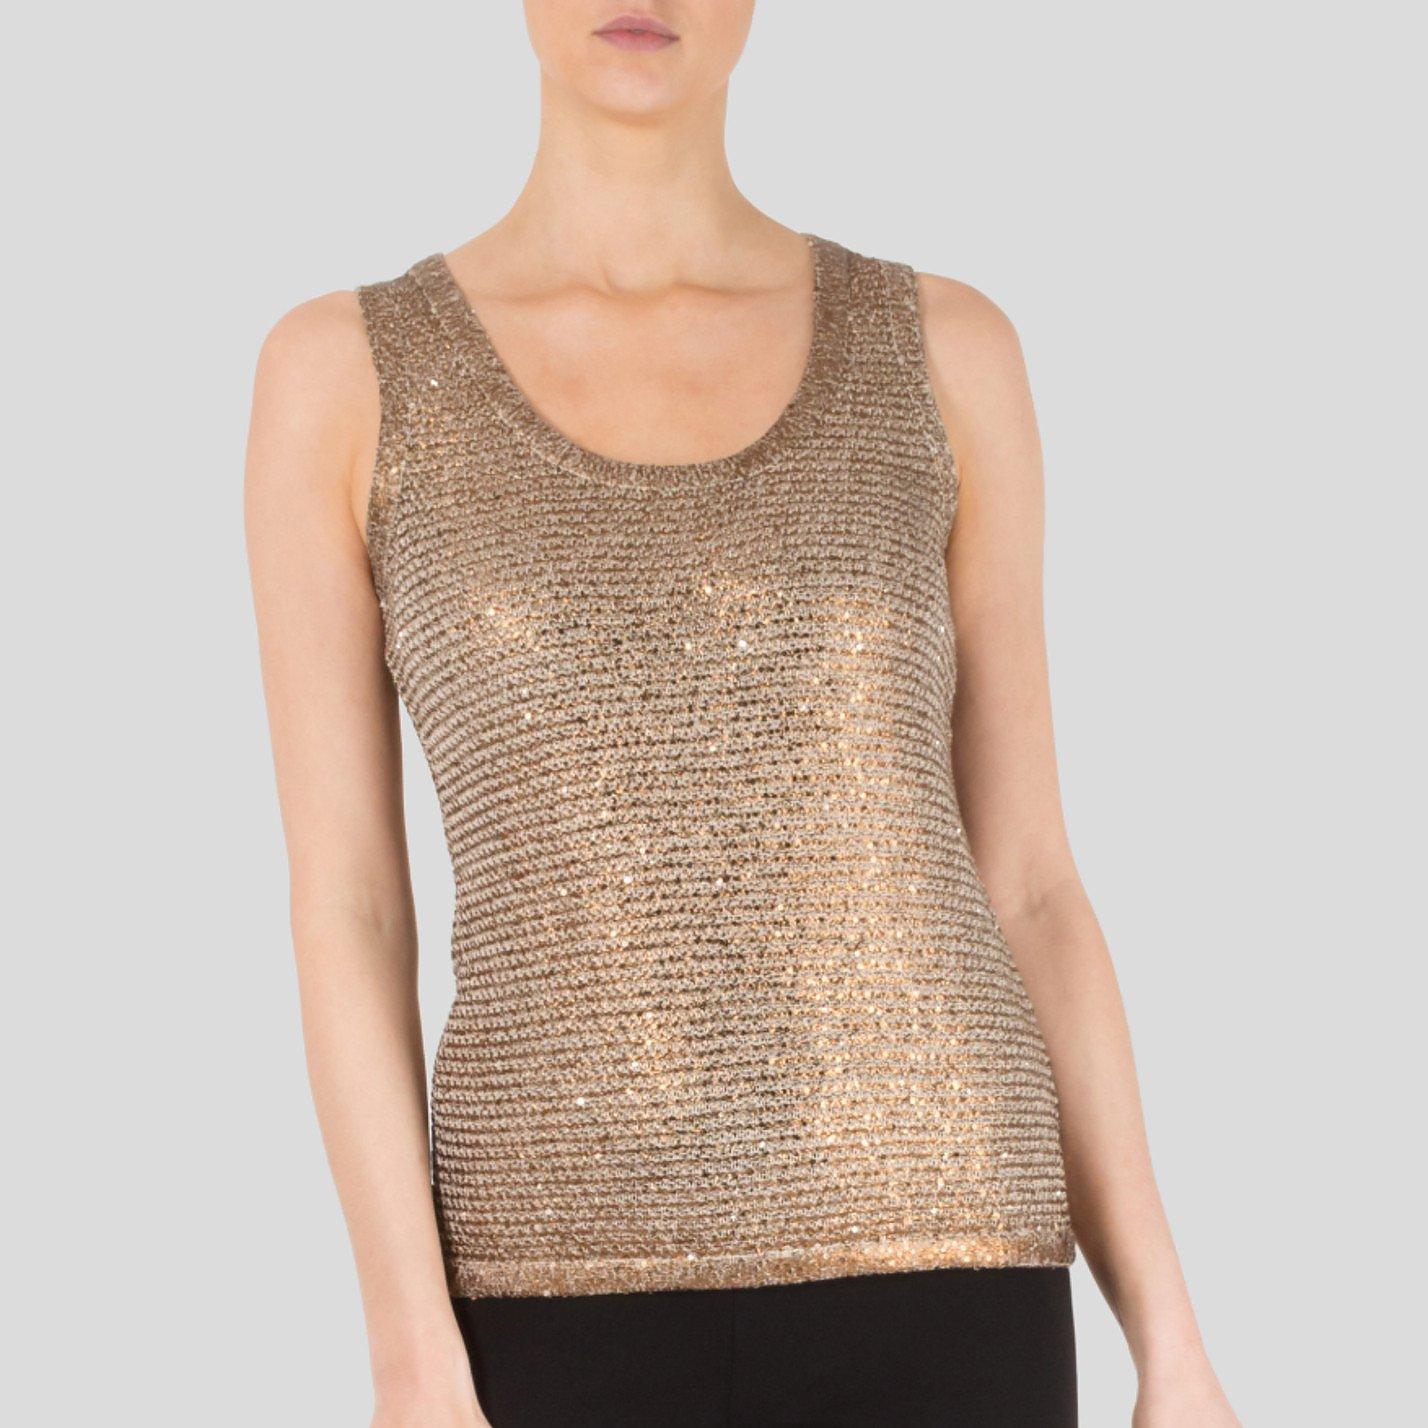 Oscar De La Renta Sequin Embellished Metallic Knitted Top